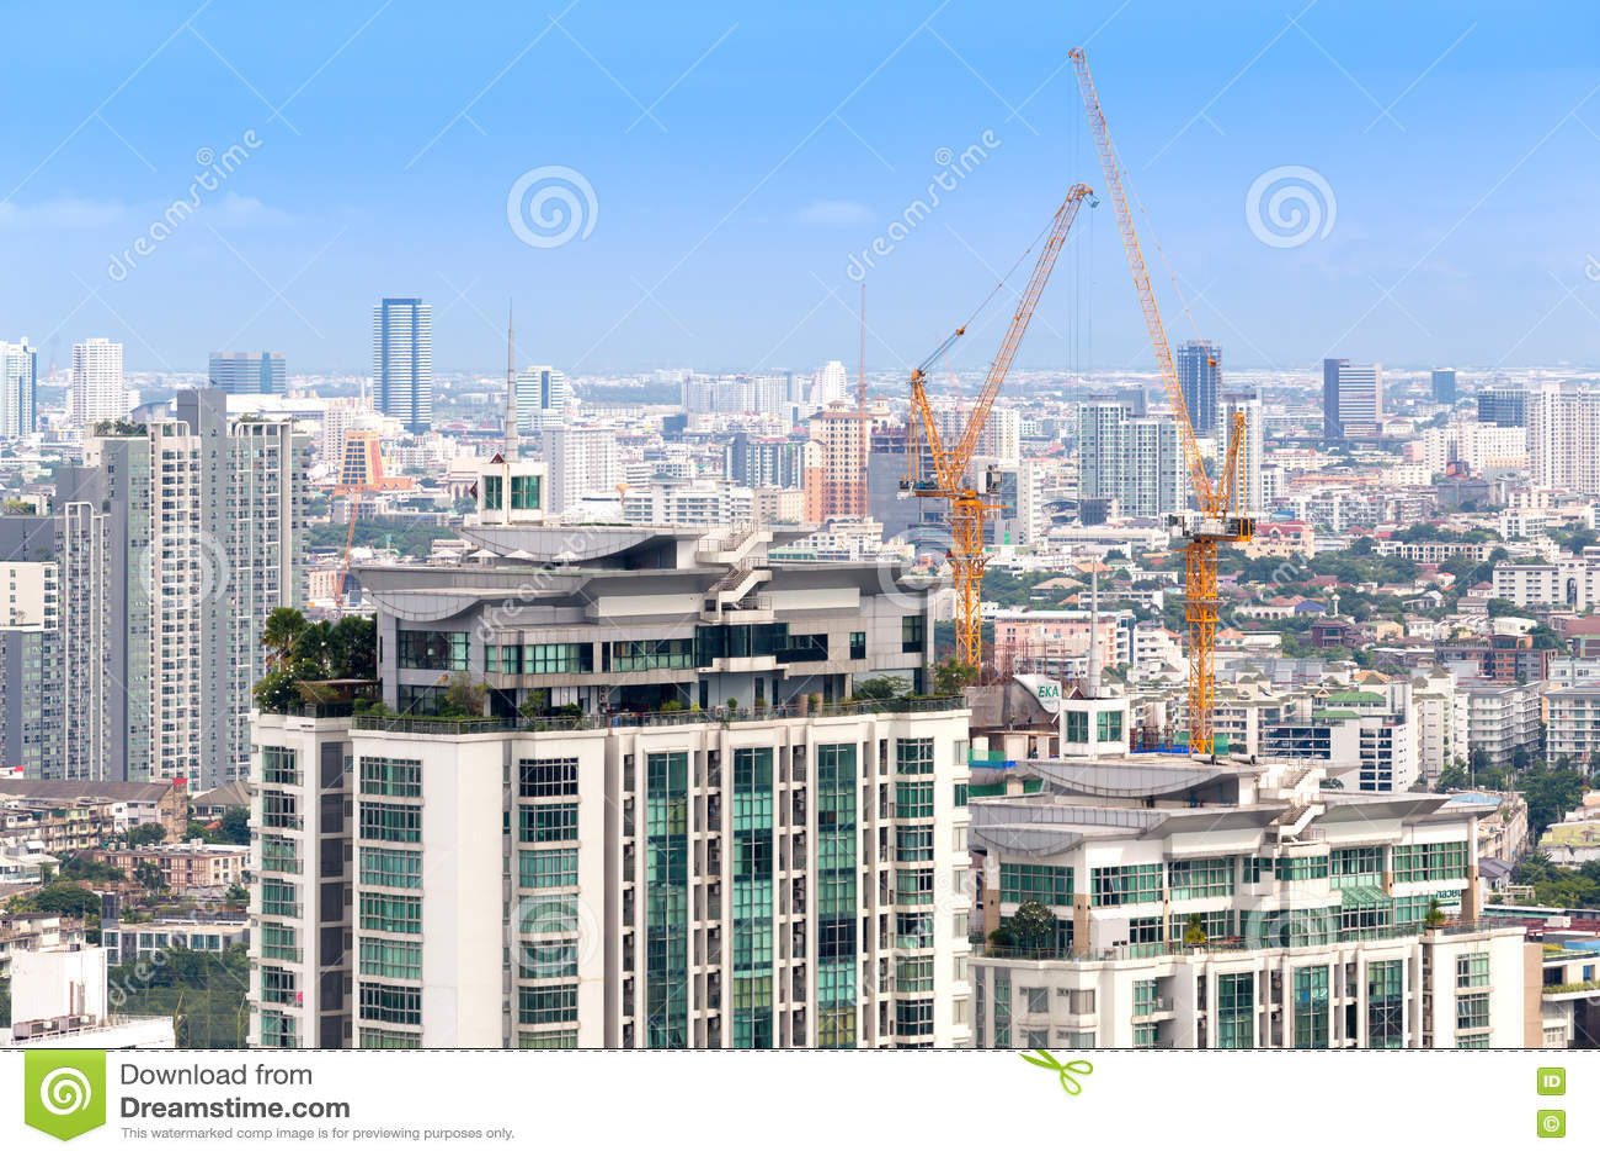 Горизонт вида на город Бангкока, Таиланд зданий